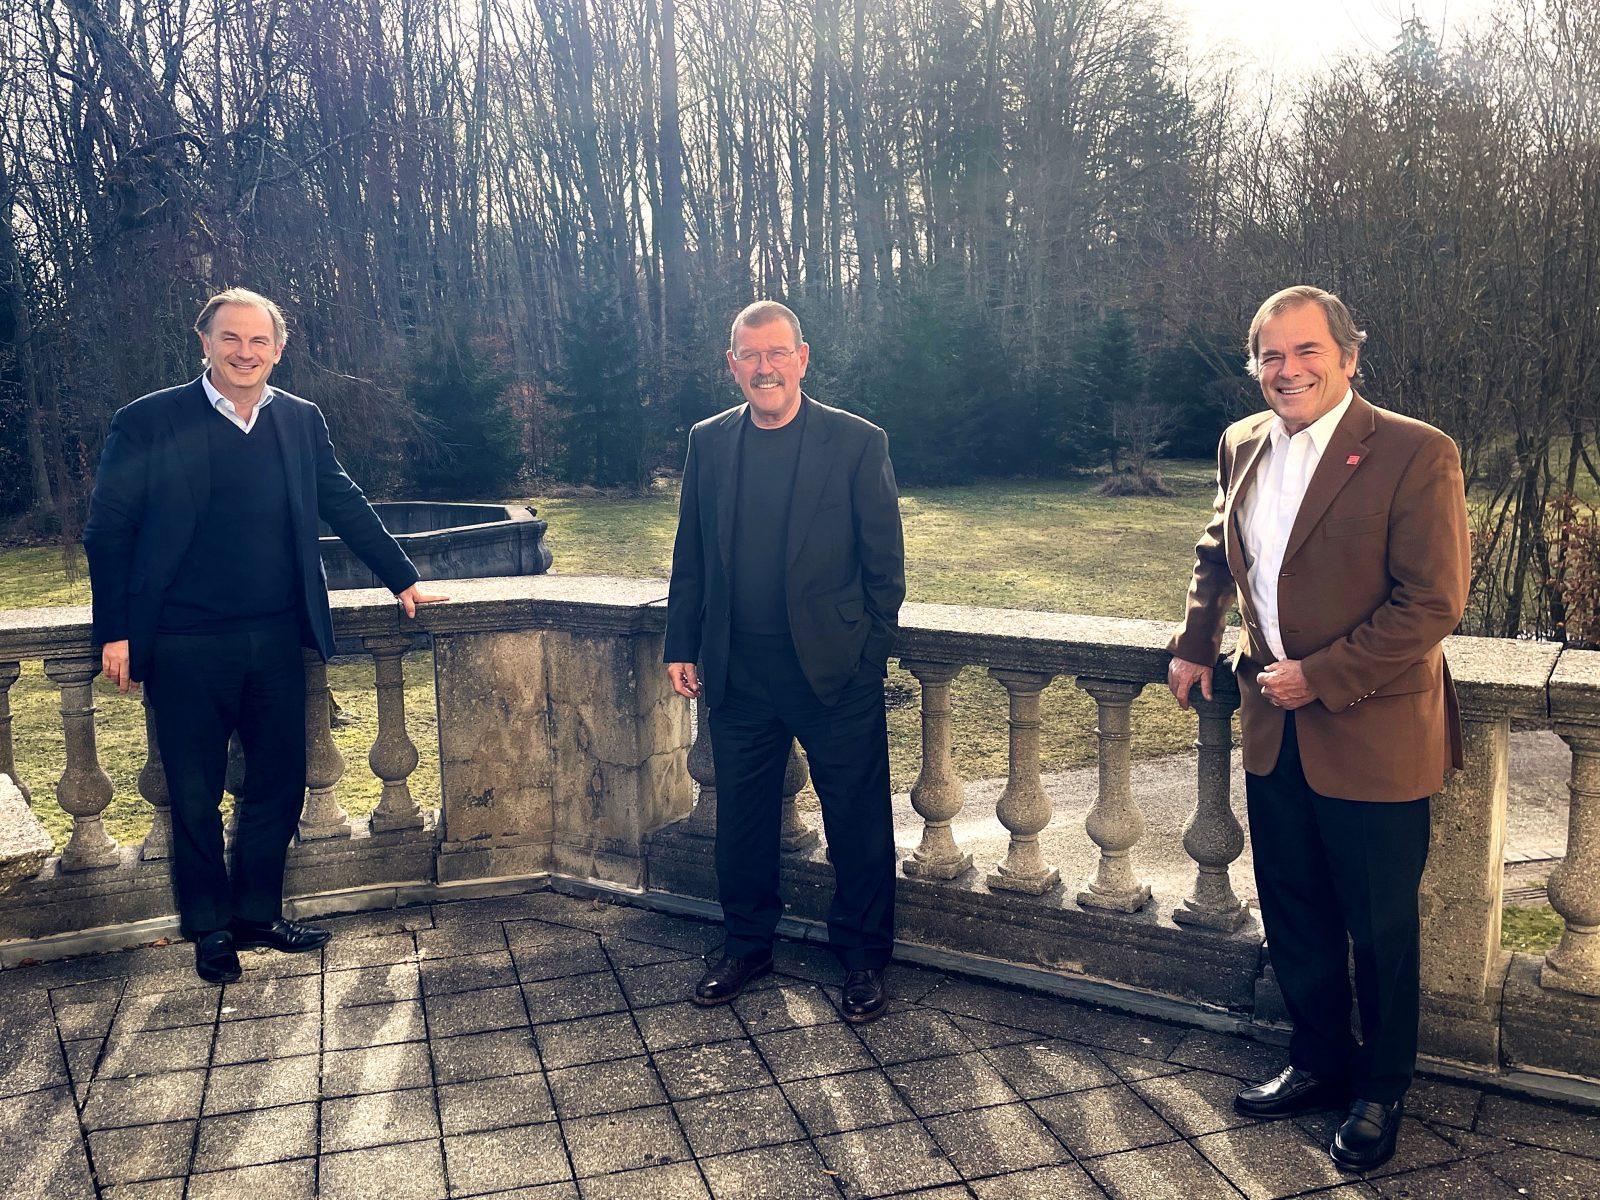 Die beiden trans-o-flex-Gesellschafter Peter Amberger (rechts) und Christoph Schoeller (links) haben den Vertrag mit CEO Wolfgang P. Albeck bis 2024 verlängert.